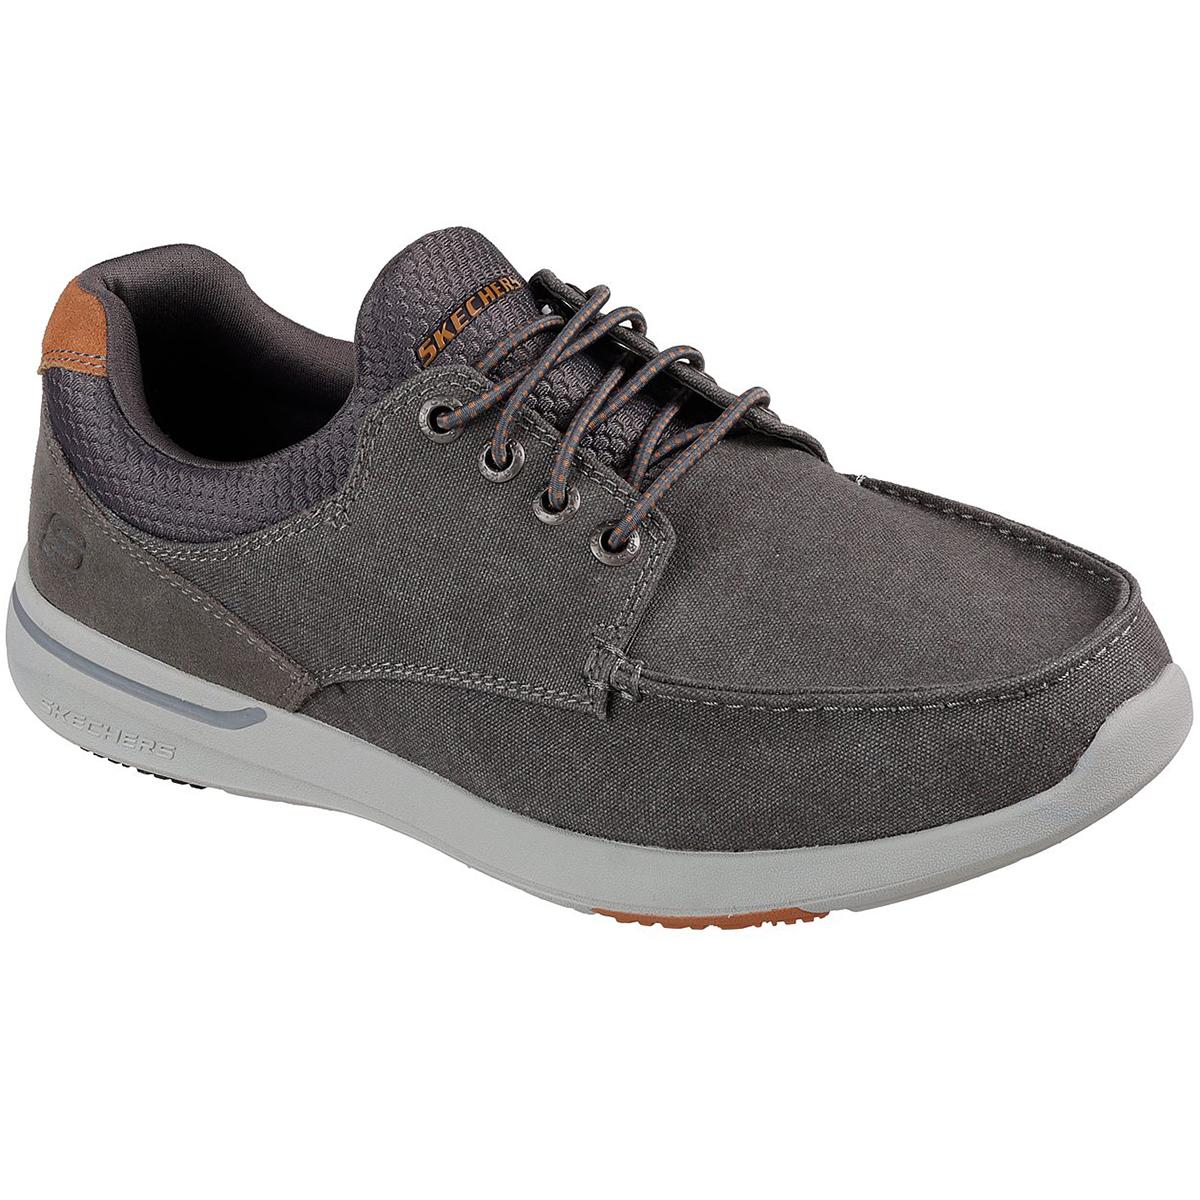 Skechers Men's Relaxed Fit: Elent- Mosen Boat Shoes - Black, 8.5